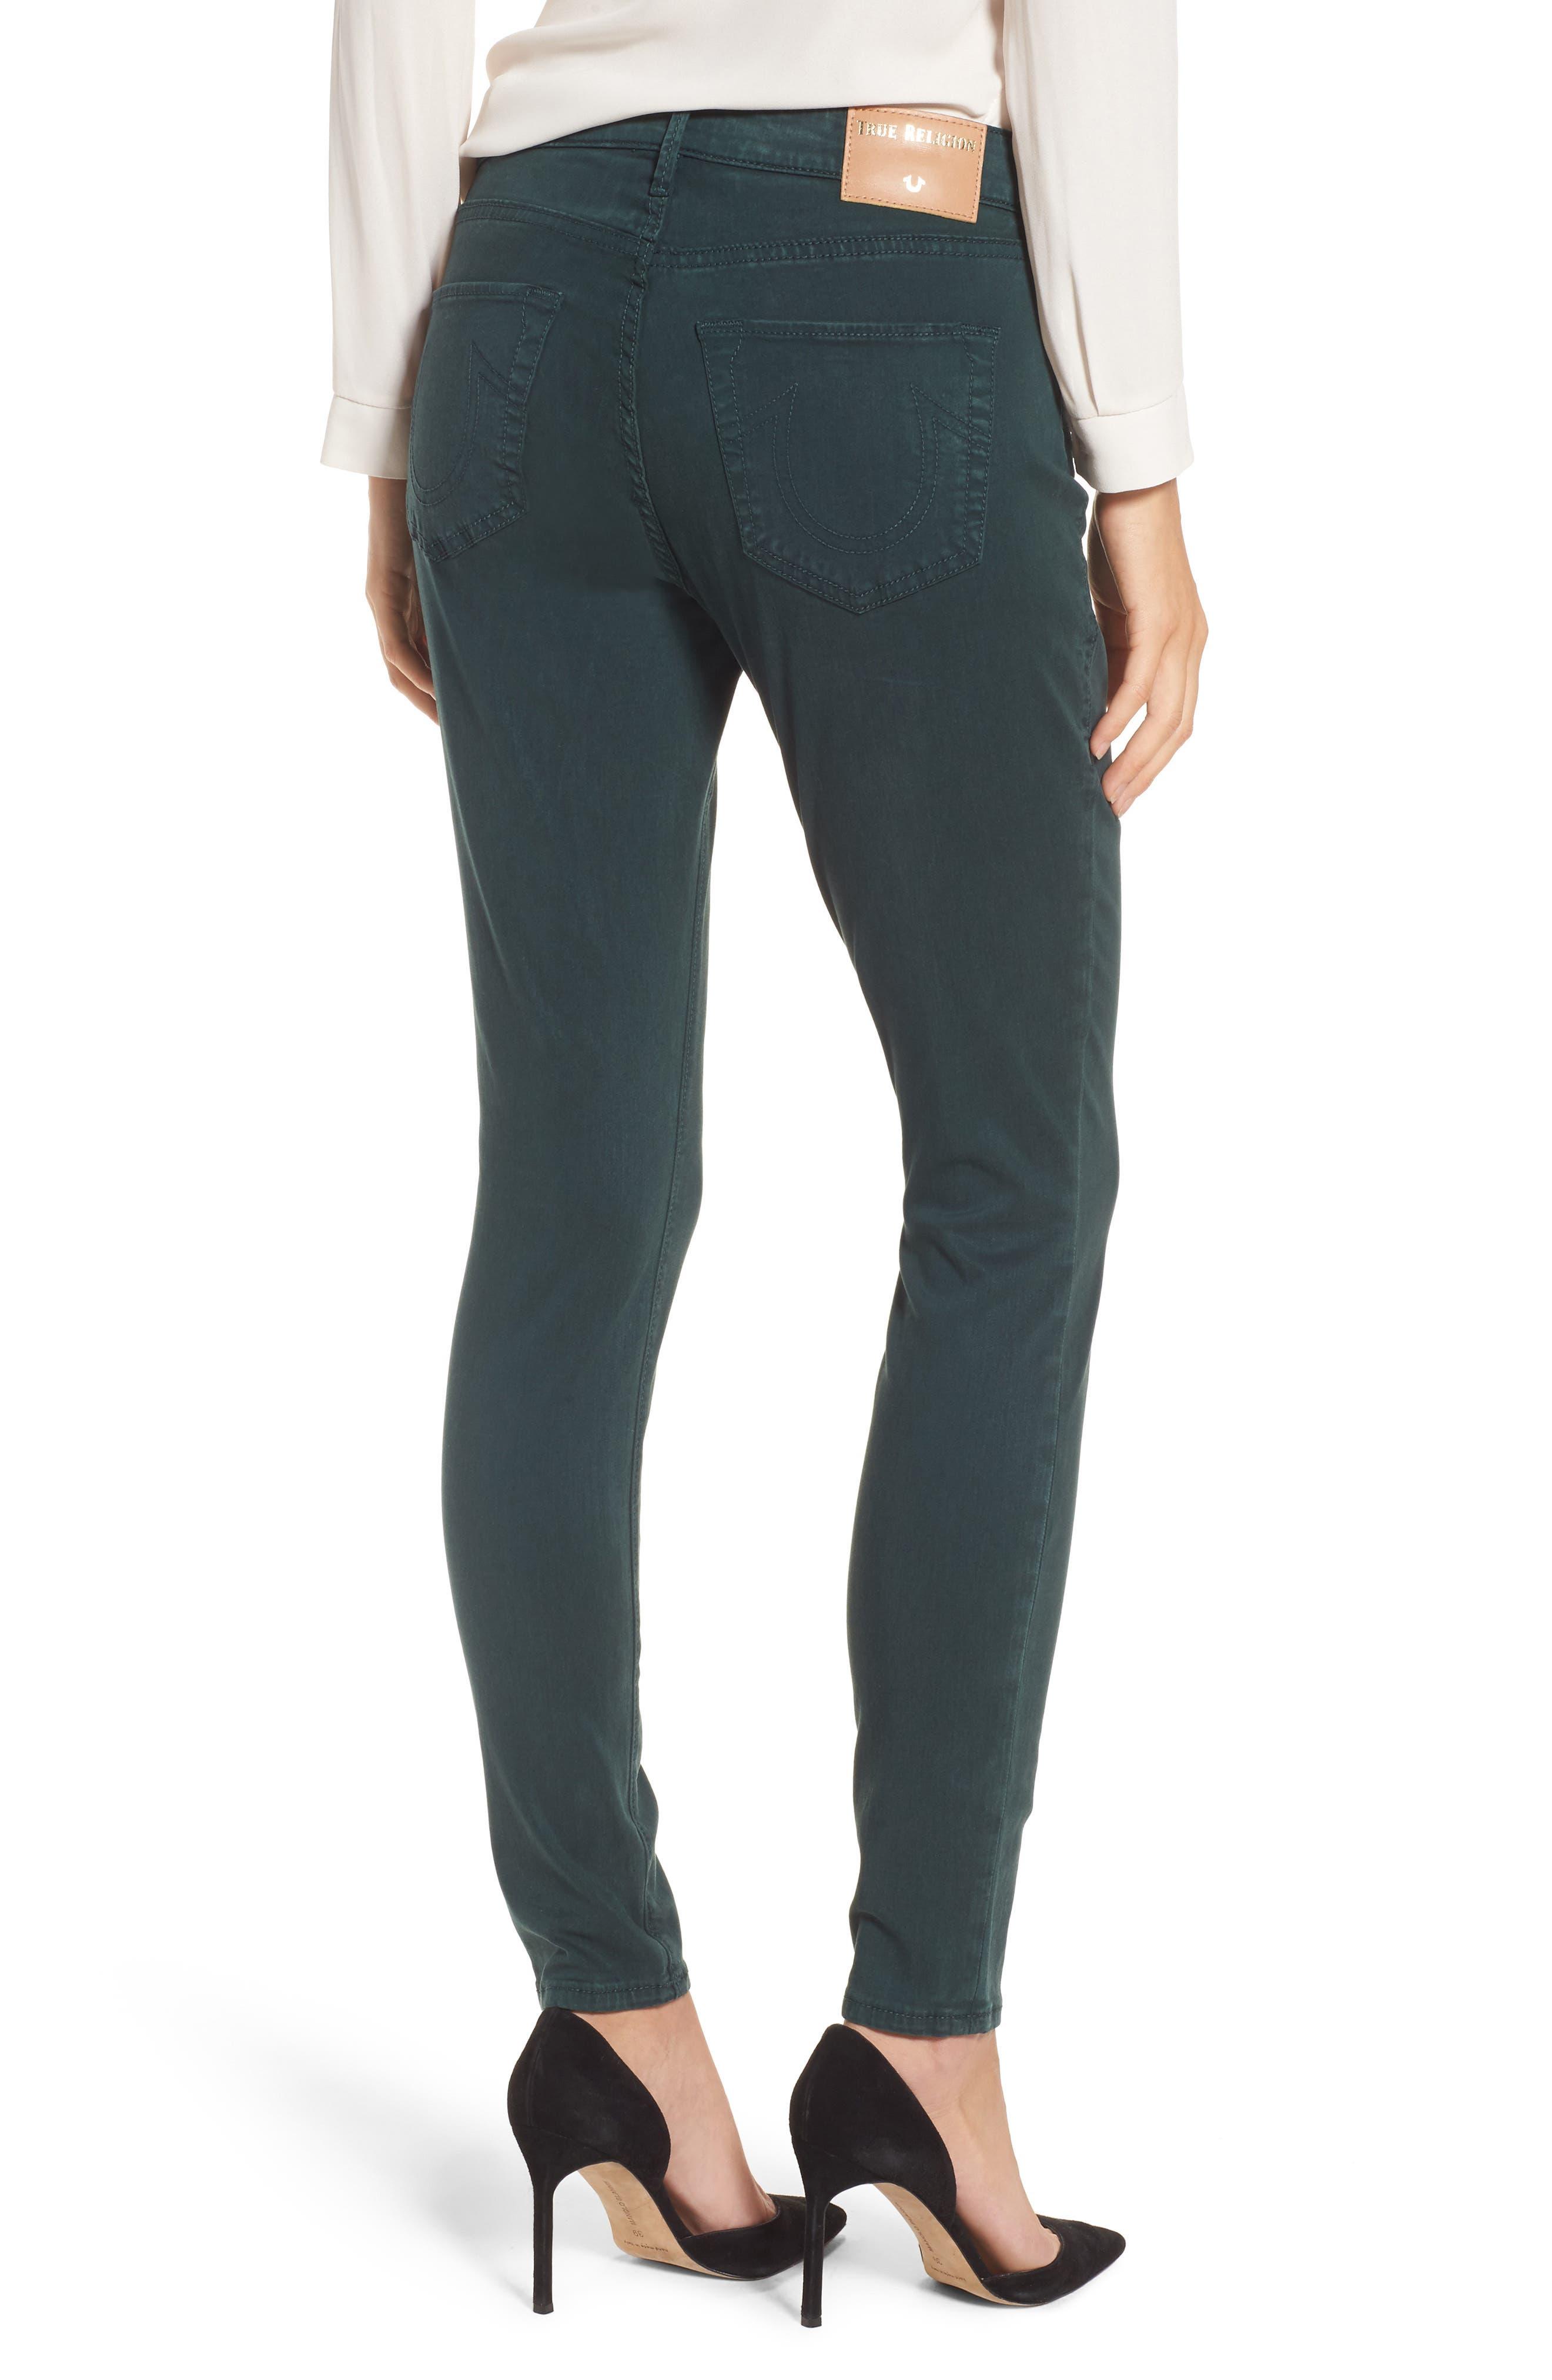 Jennie Curvy Skinny Jeans,                             Alternate thumbnail 2, color,                             Hunter Green